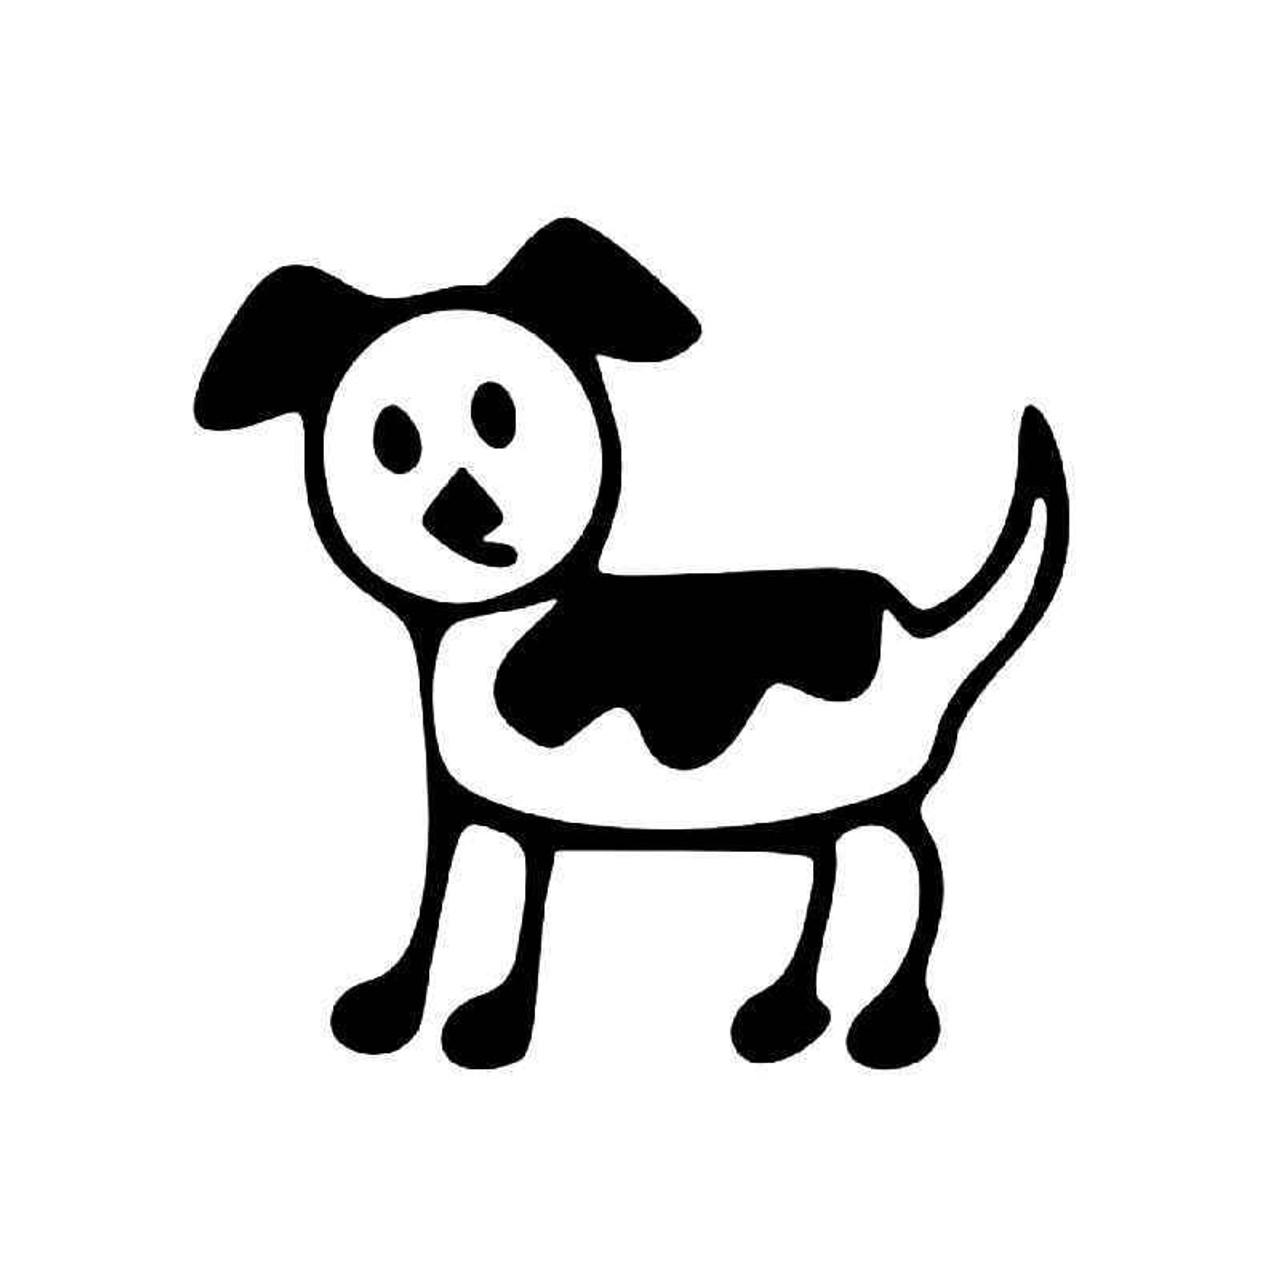 Dog Stick Figure 4 Vinyl Sticker